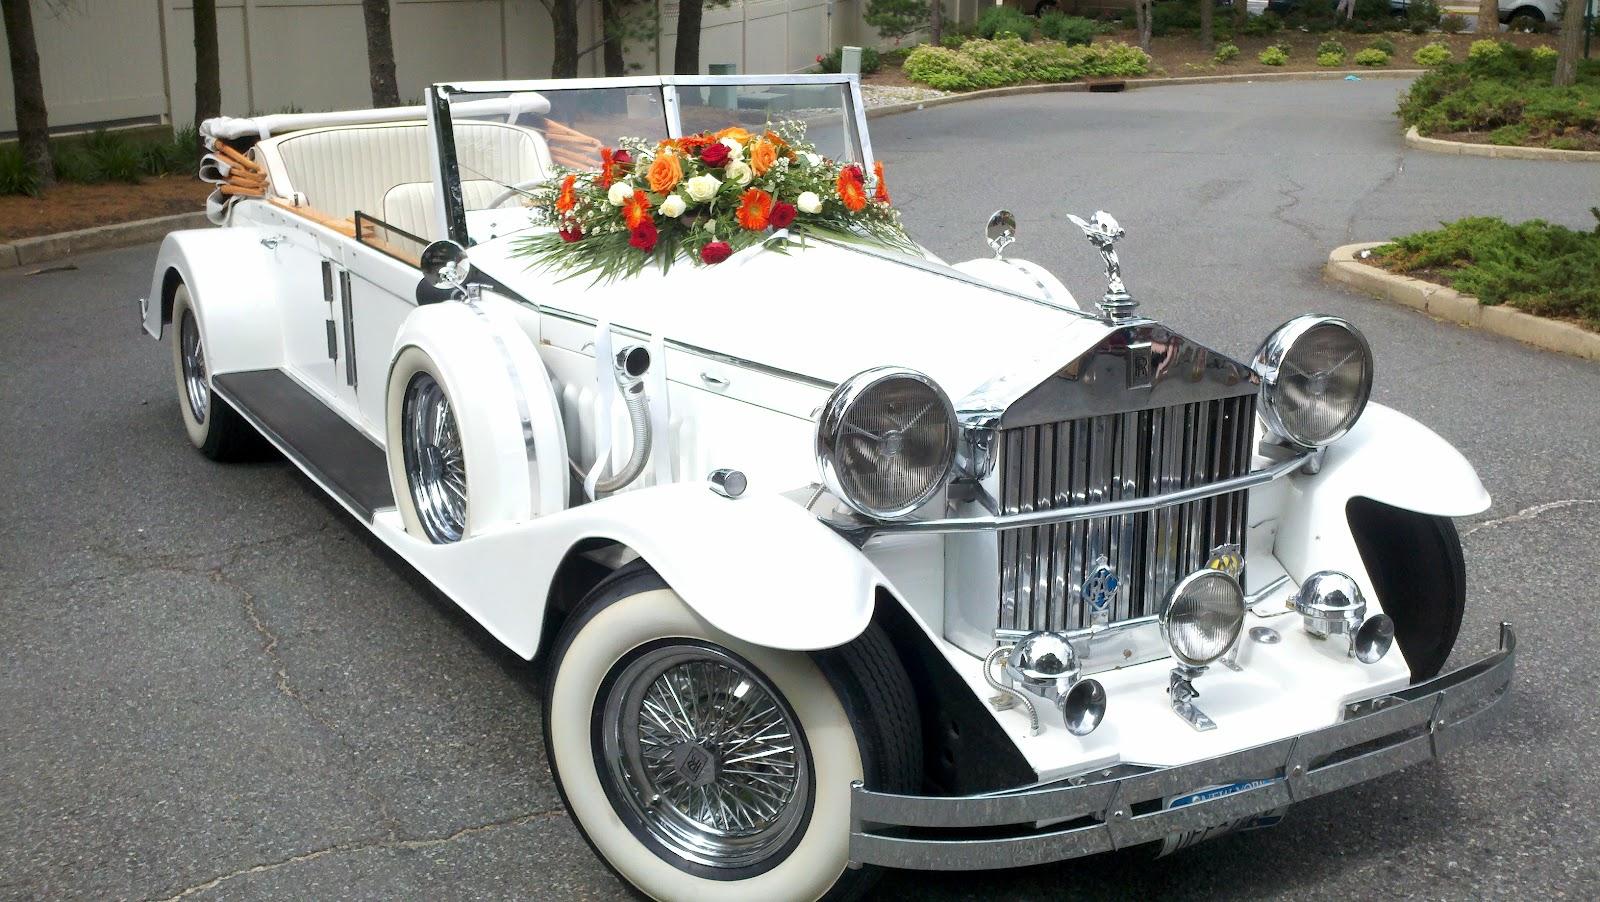 Bridal Car Rental Manila Rates